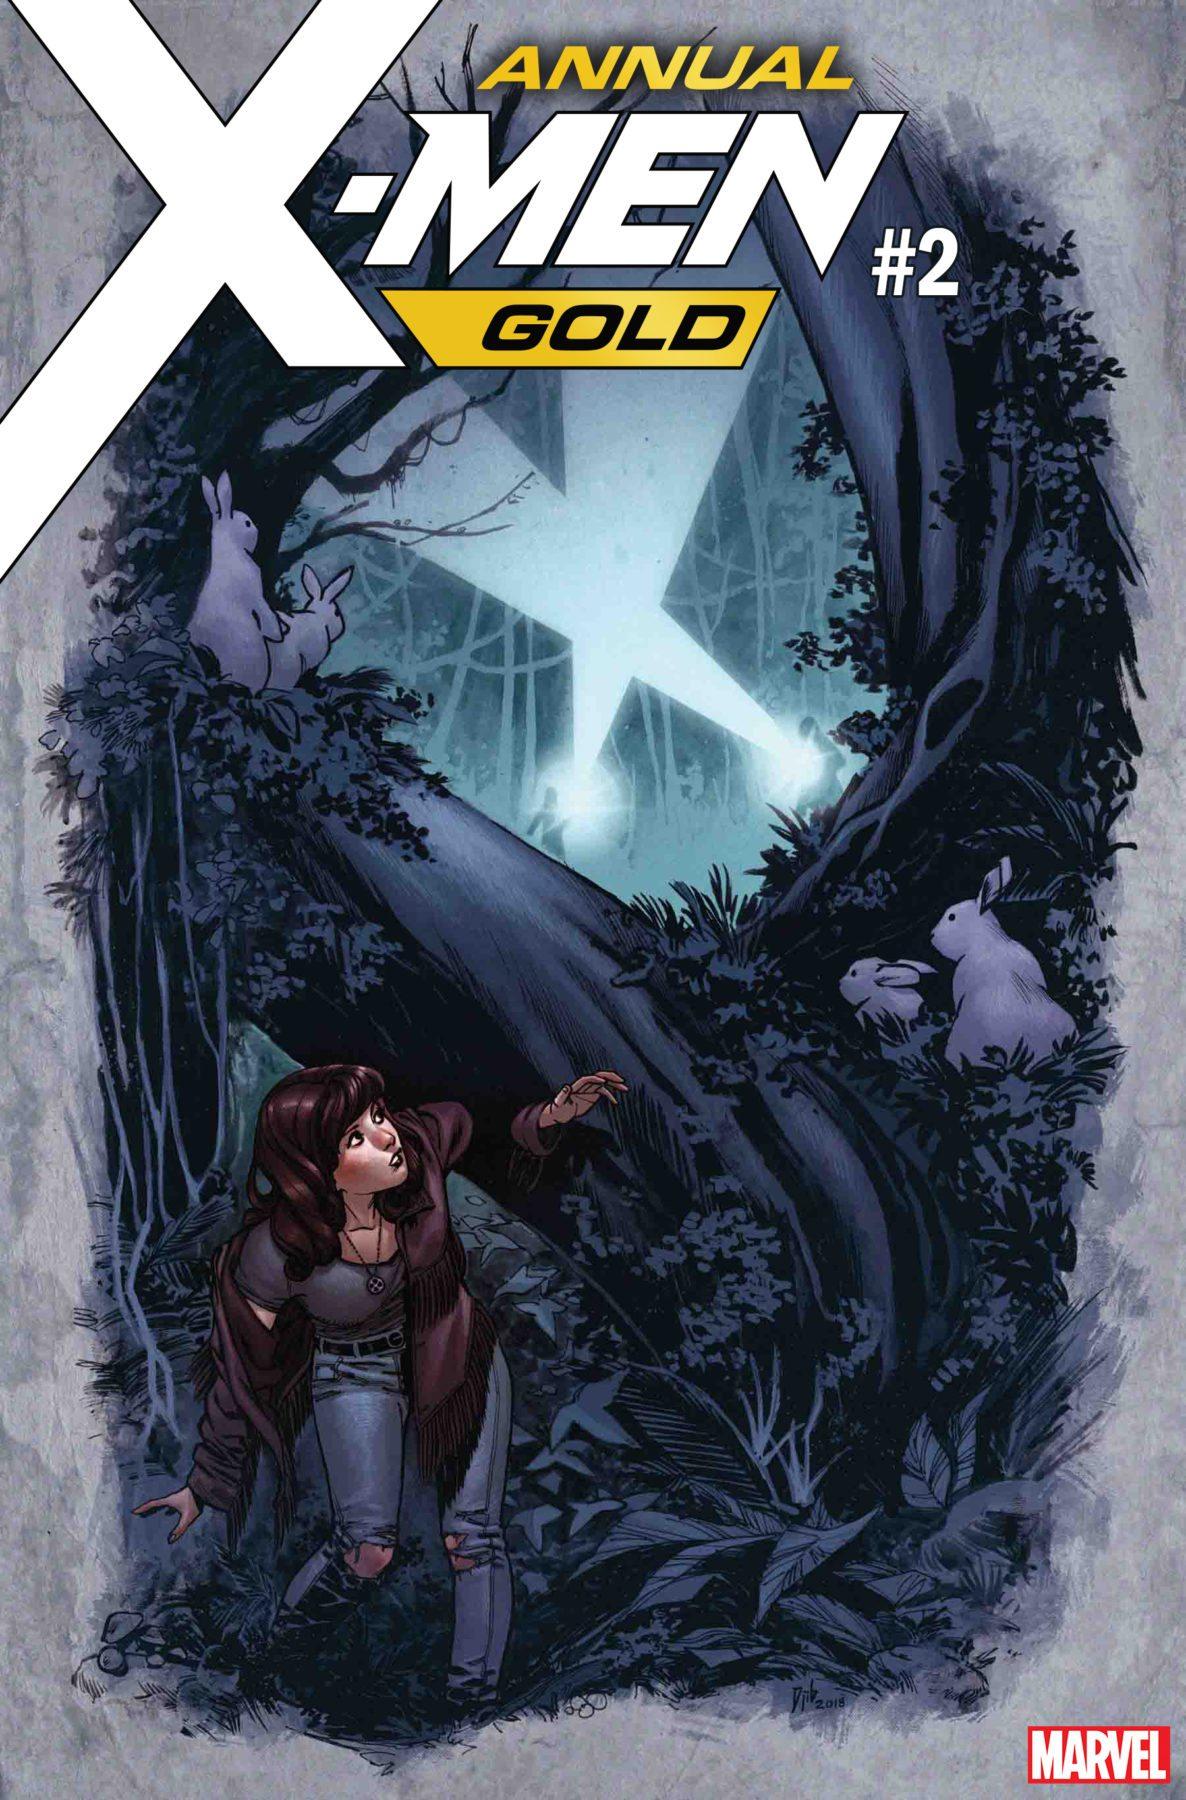 X-Men Gold Annual # 2 para explorar el primer romance de Kitty Pryde